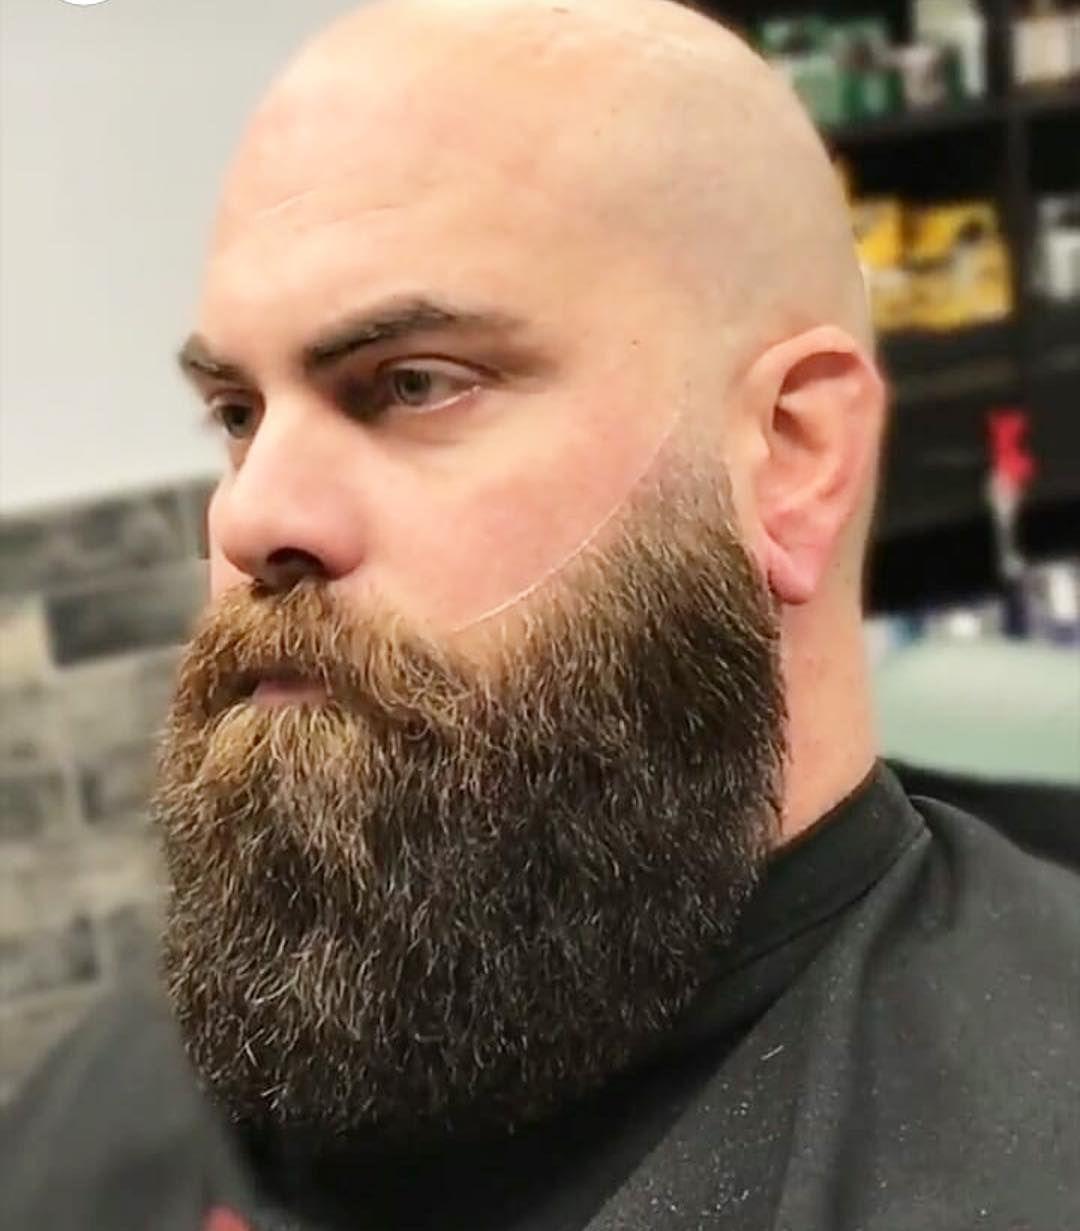 Image May Contain 1 Person Beard And Closeup Bald Men With Beards Bald Head With Beard Bald With Beard